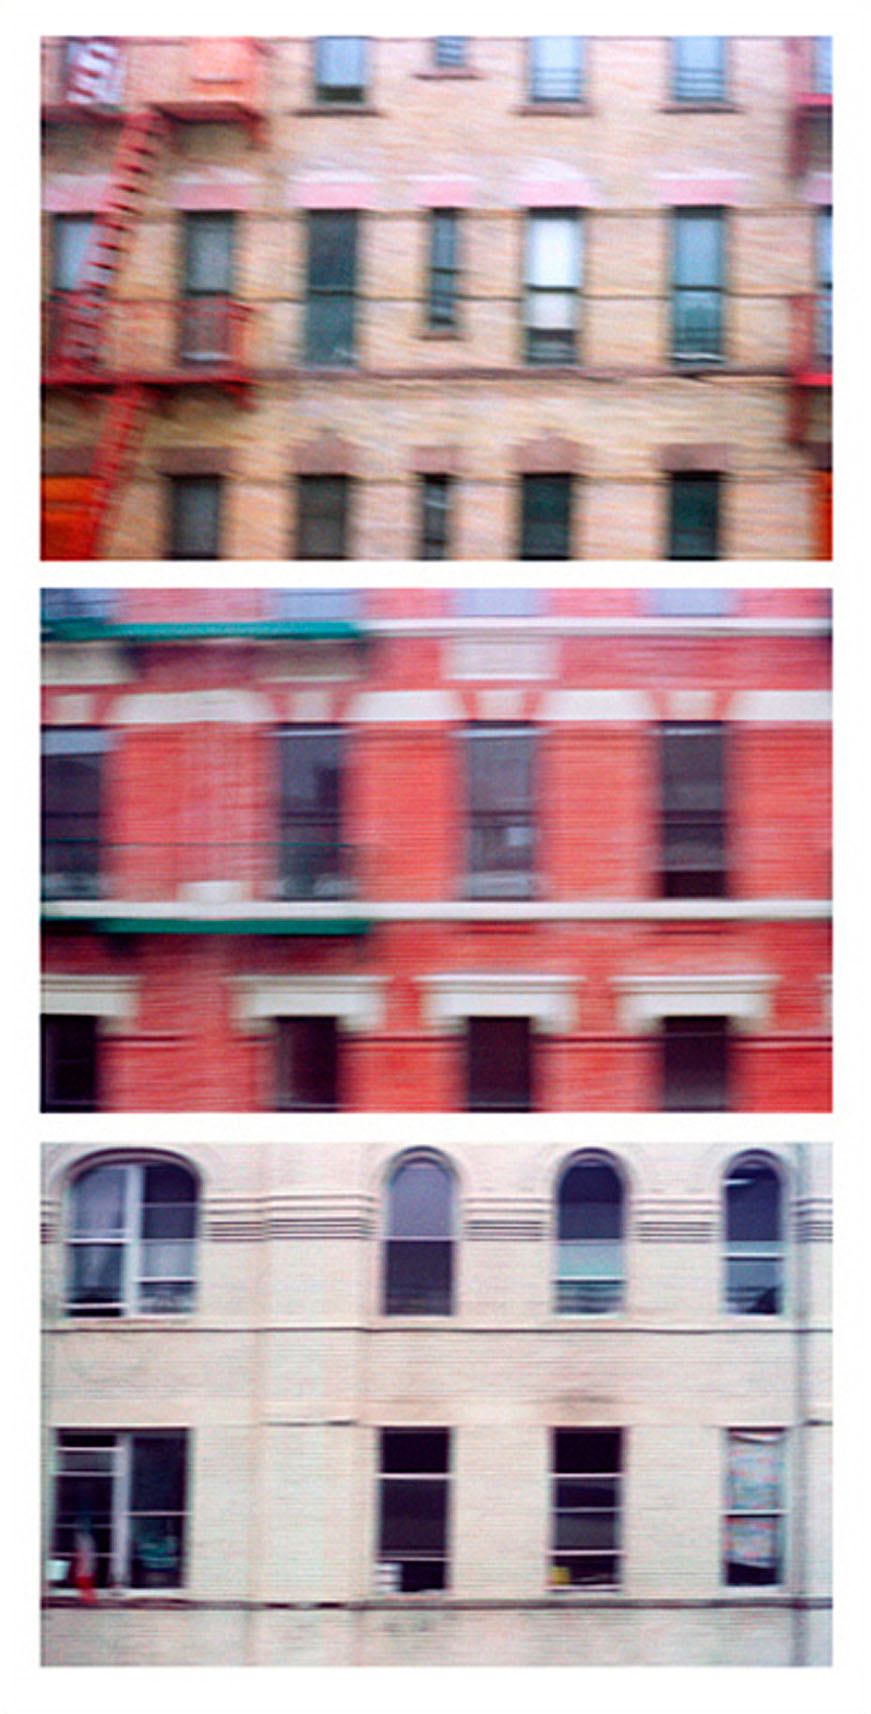 Apartment Buildings, Metro-North Line Entering NYC